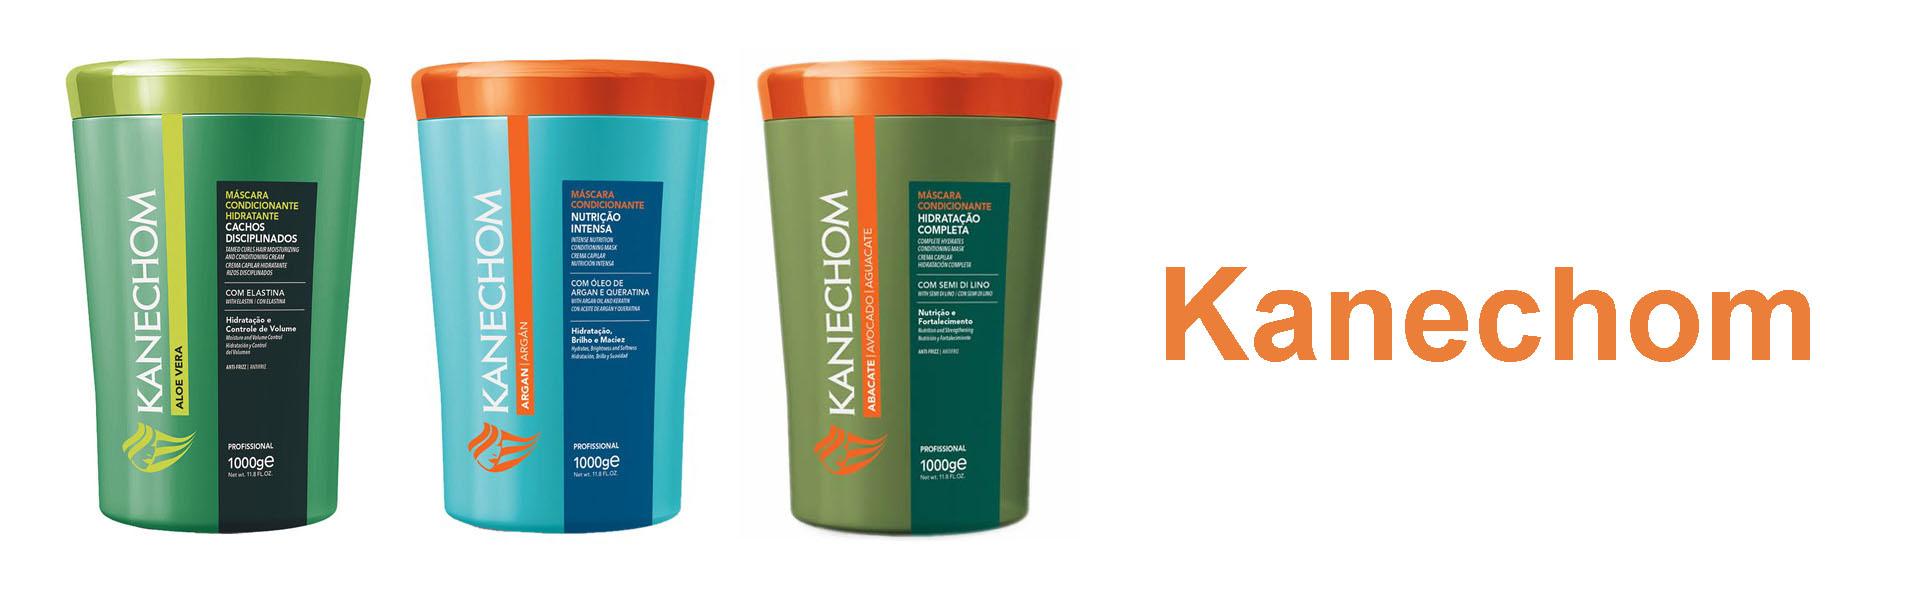 Kanechom - Just Beauty Supplies